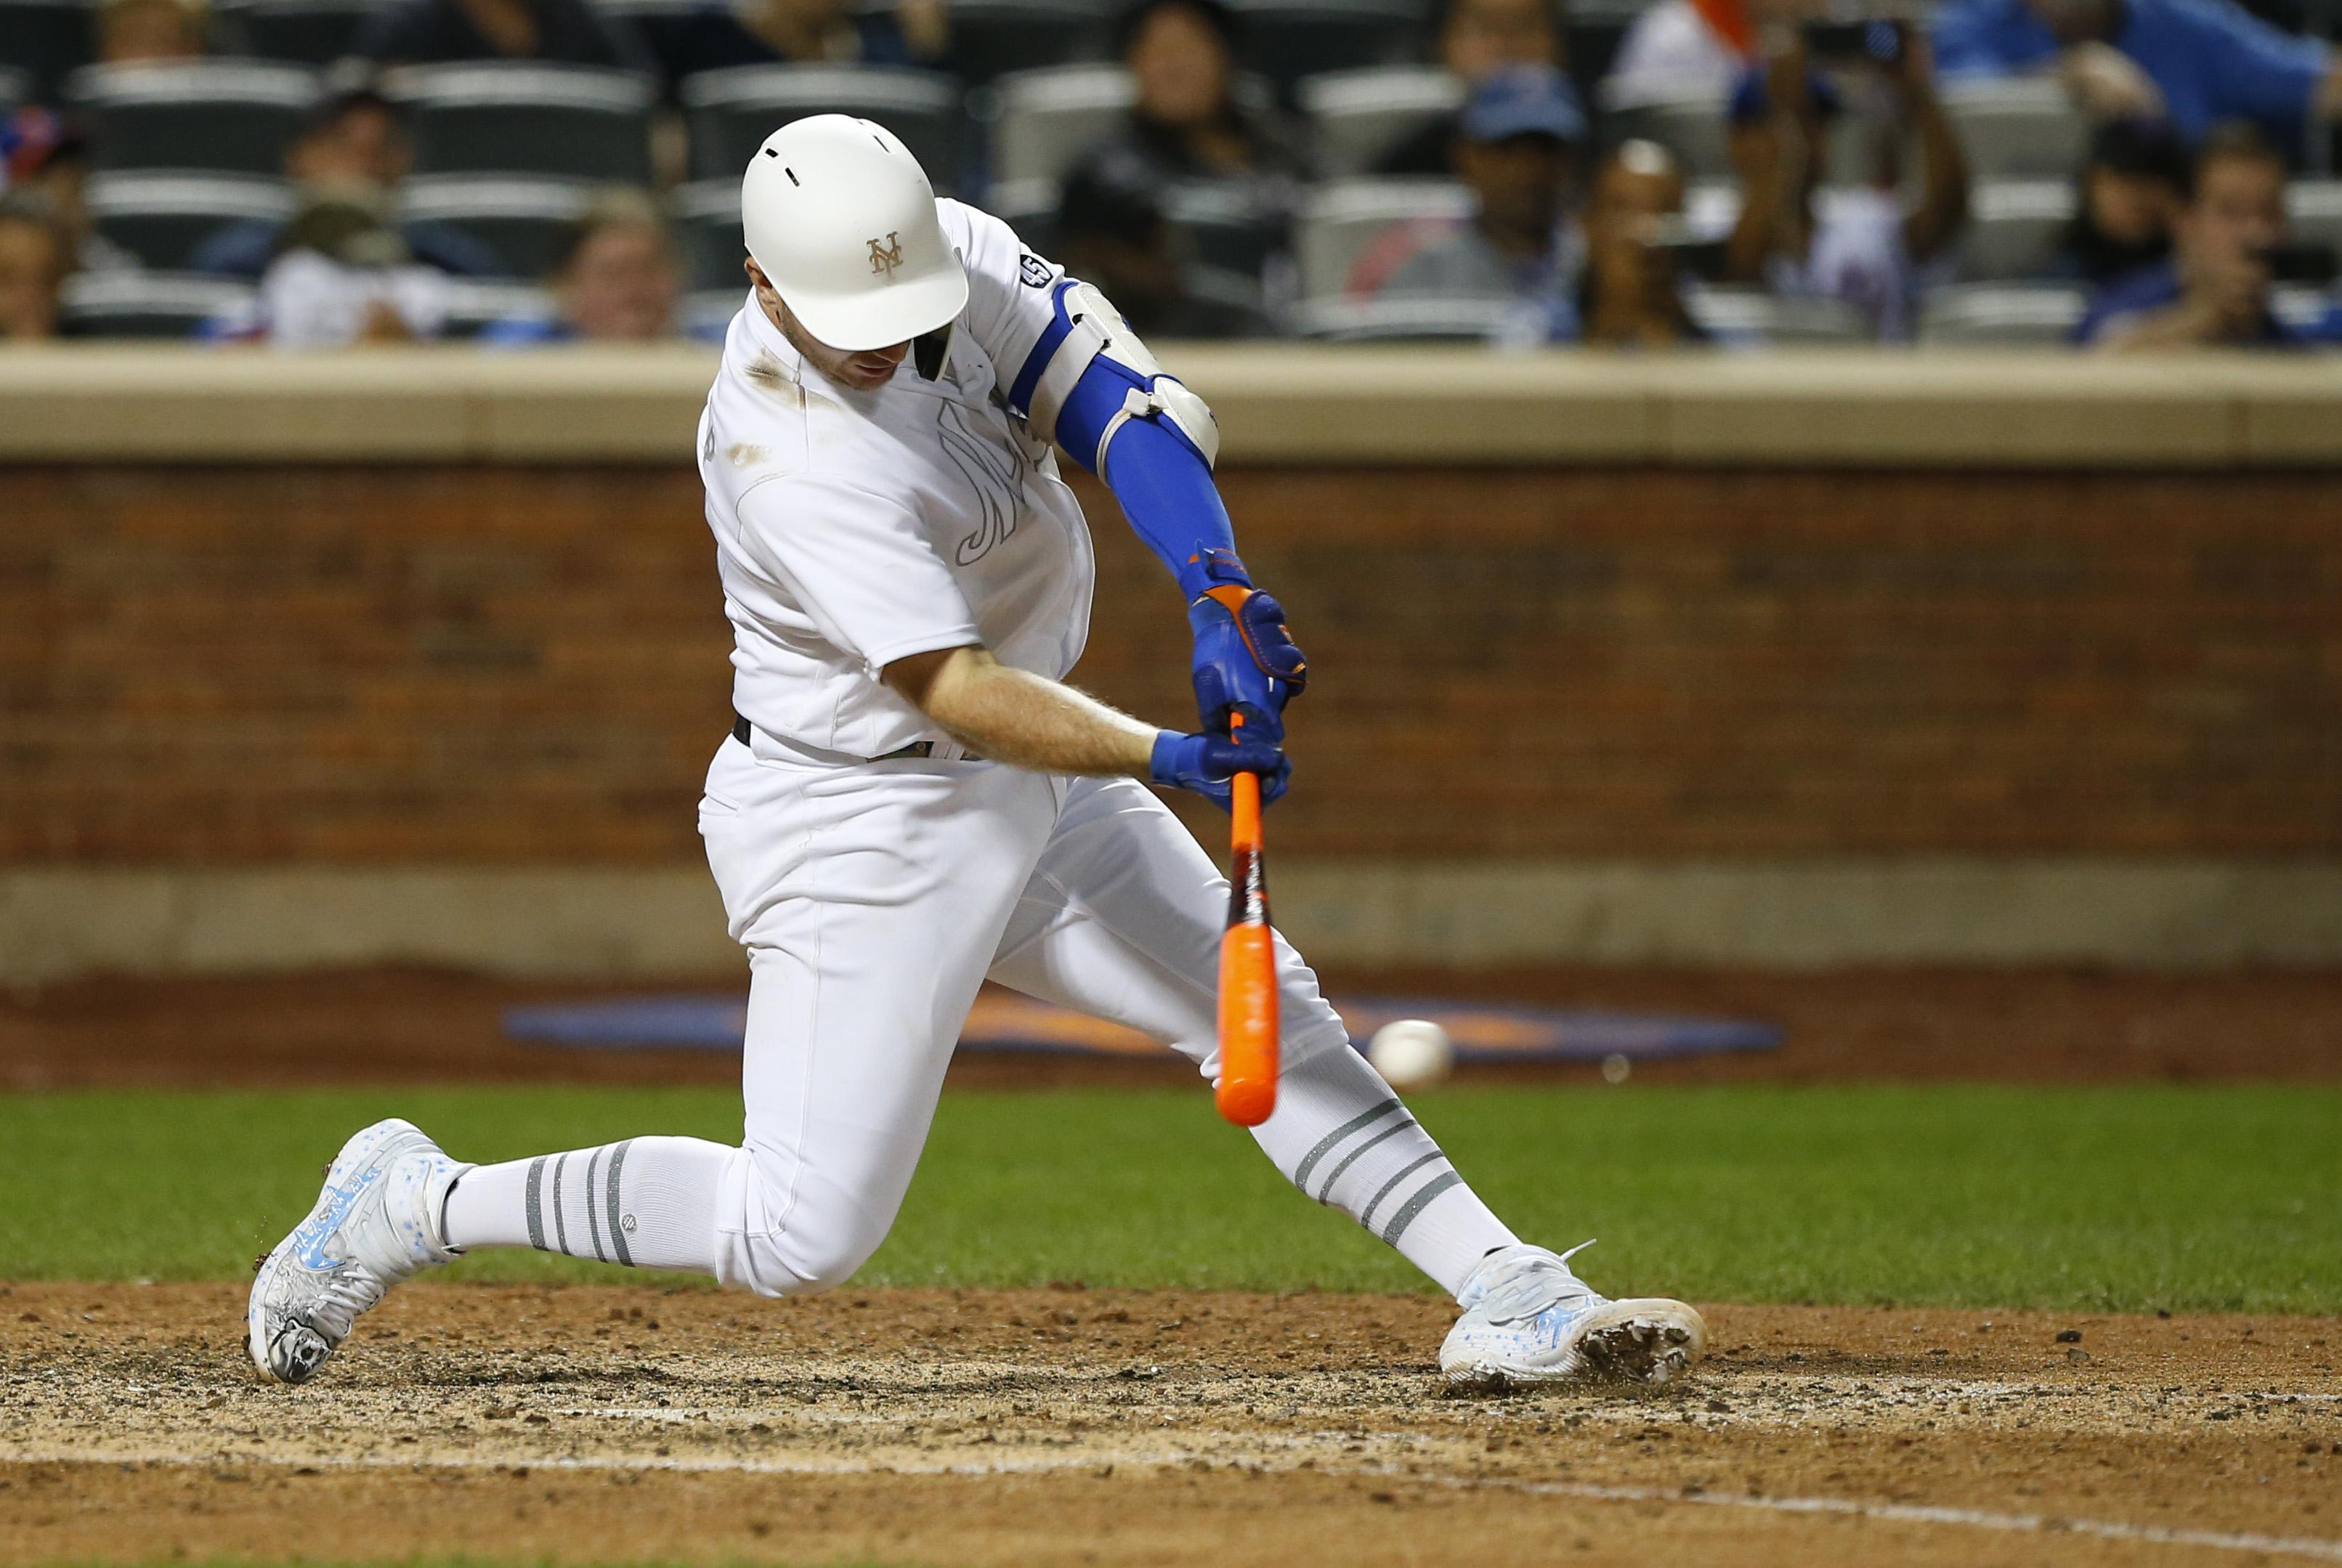 8/24/19 Game Preview: Atlanta Braves at New York Mets